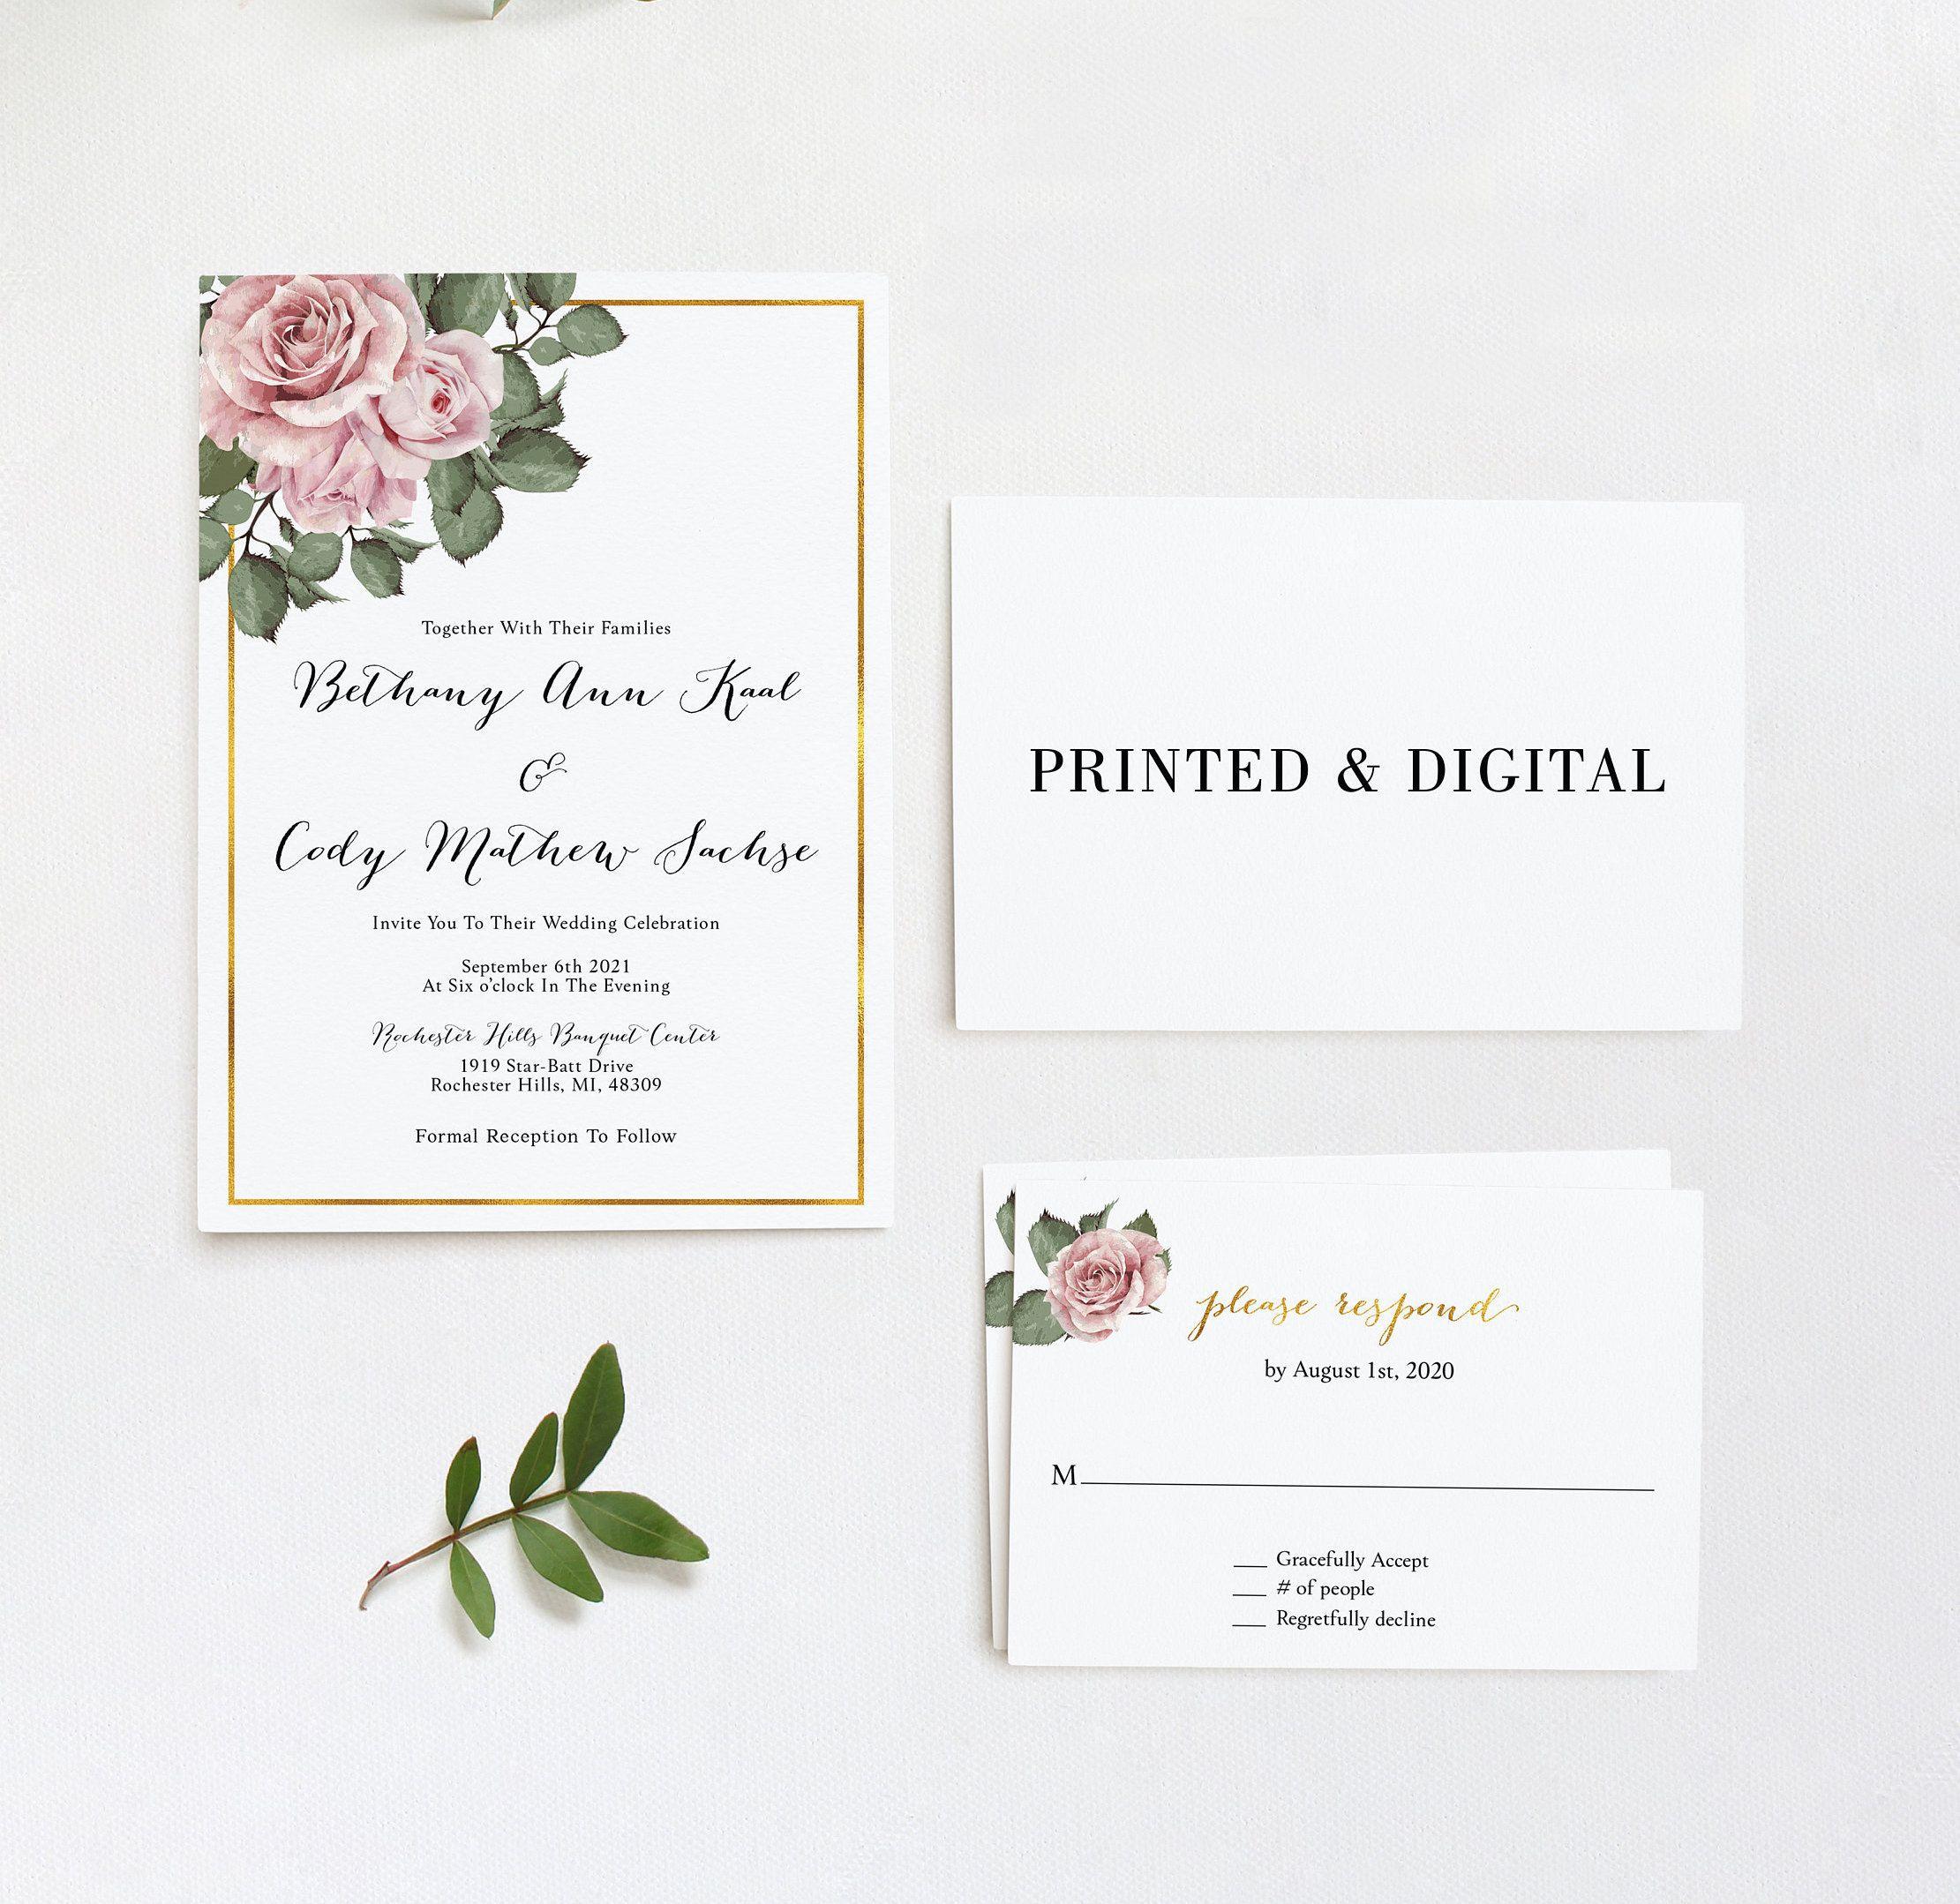 Printed Wedding Invitation Wedding Invite Wedding Invites Etsy Printing Wedding Invitations Wedding Invitations Personalised Wedding Invitations